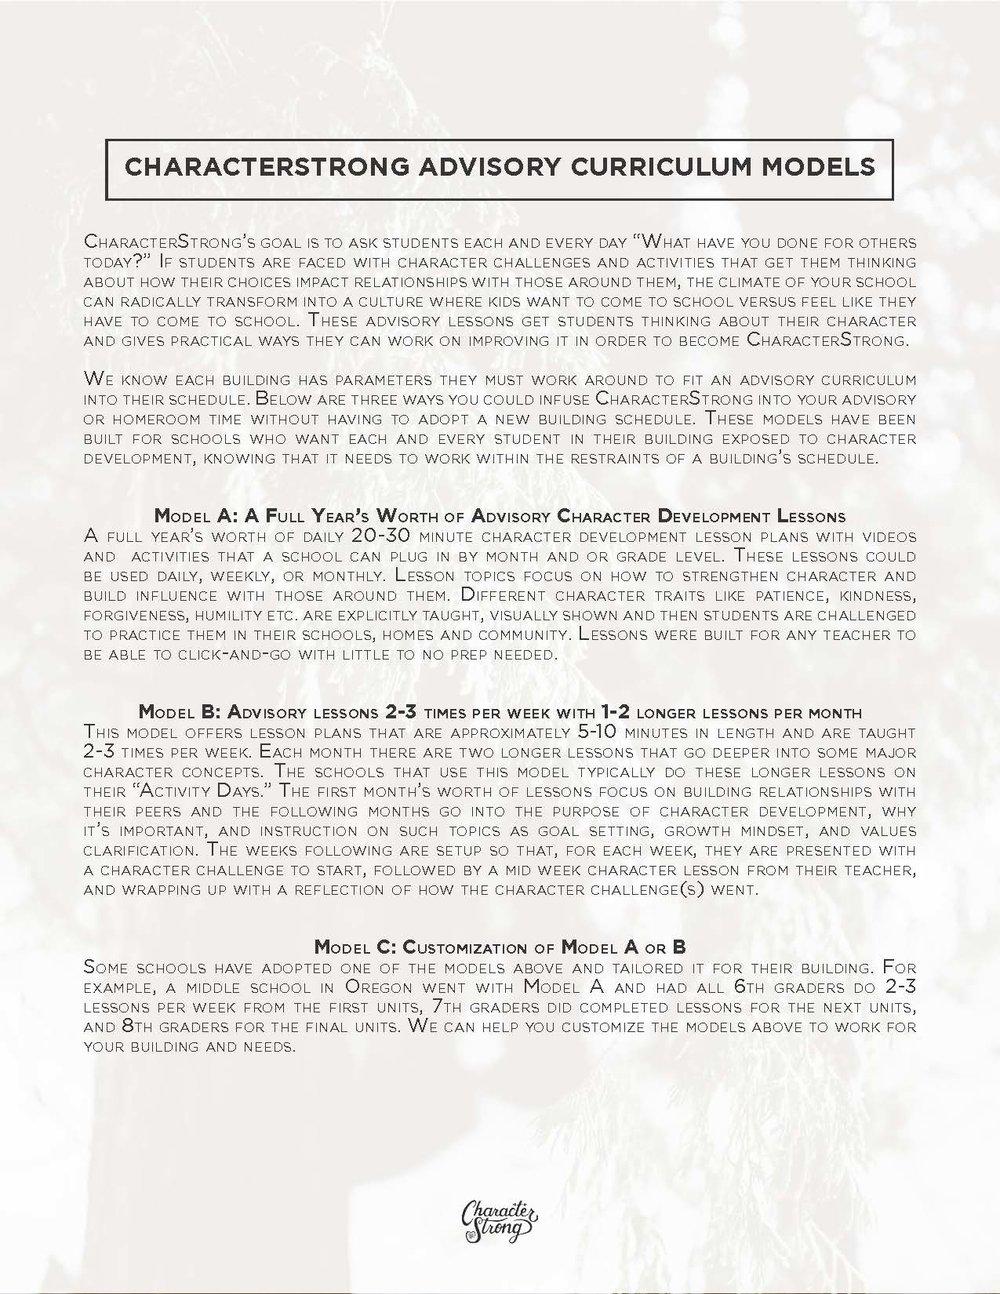 Curriculum Models Image.jpg